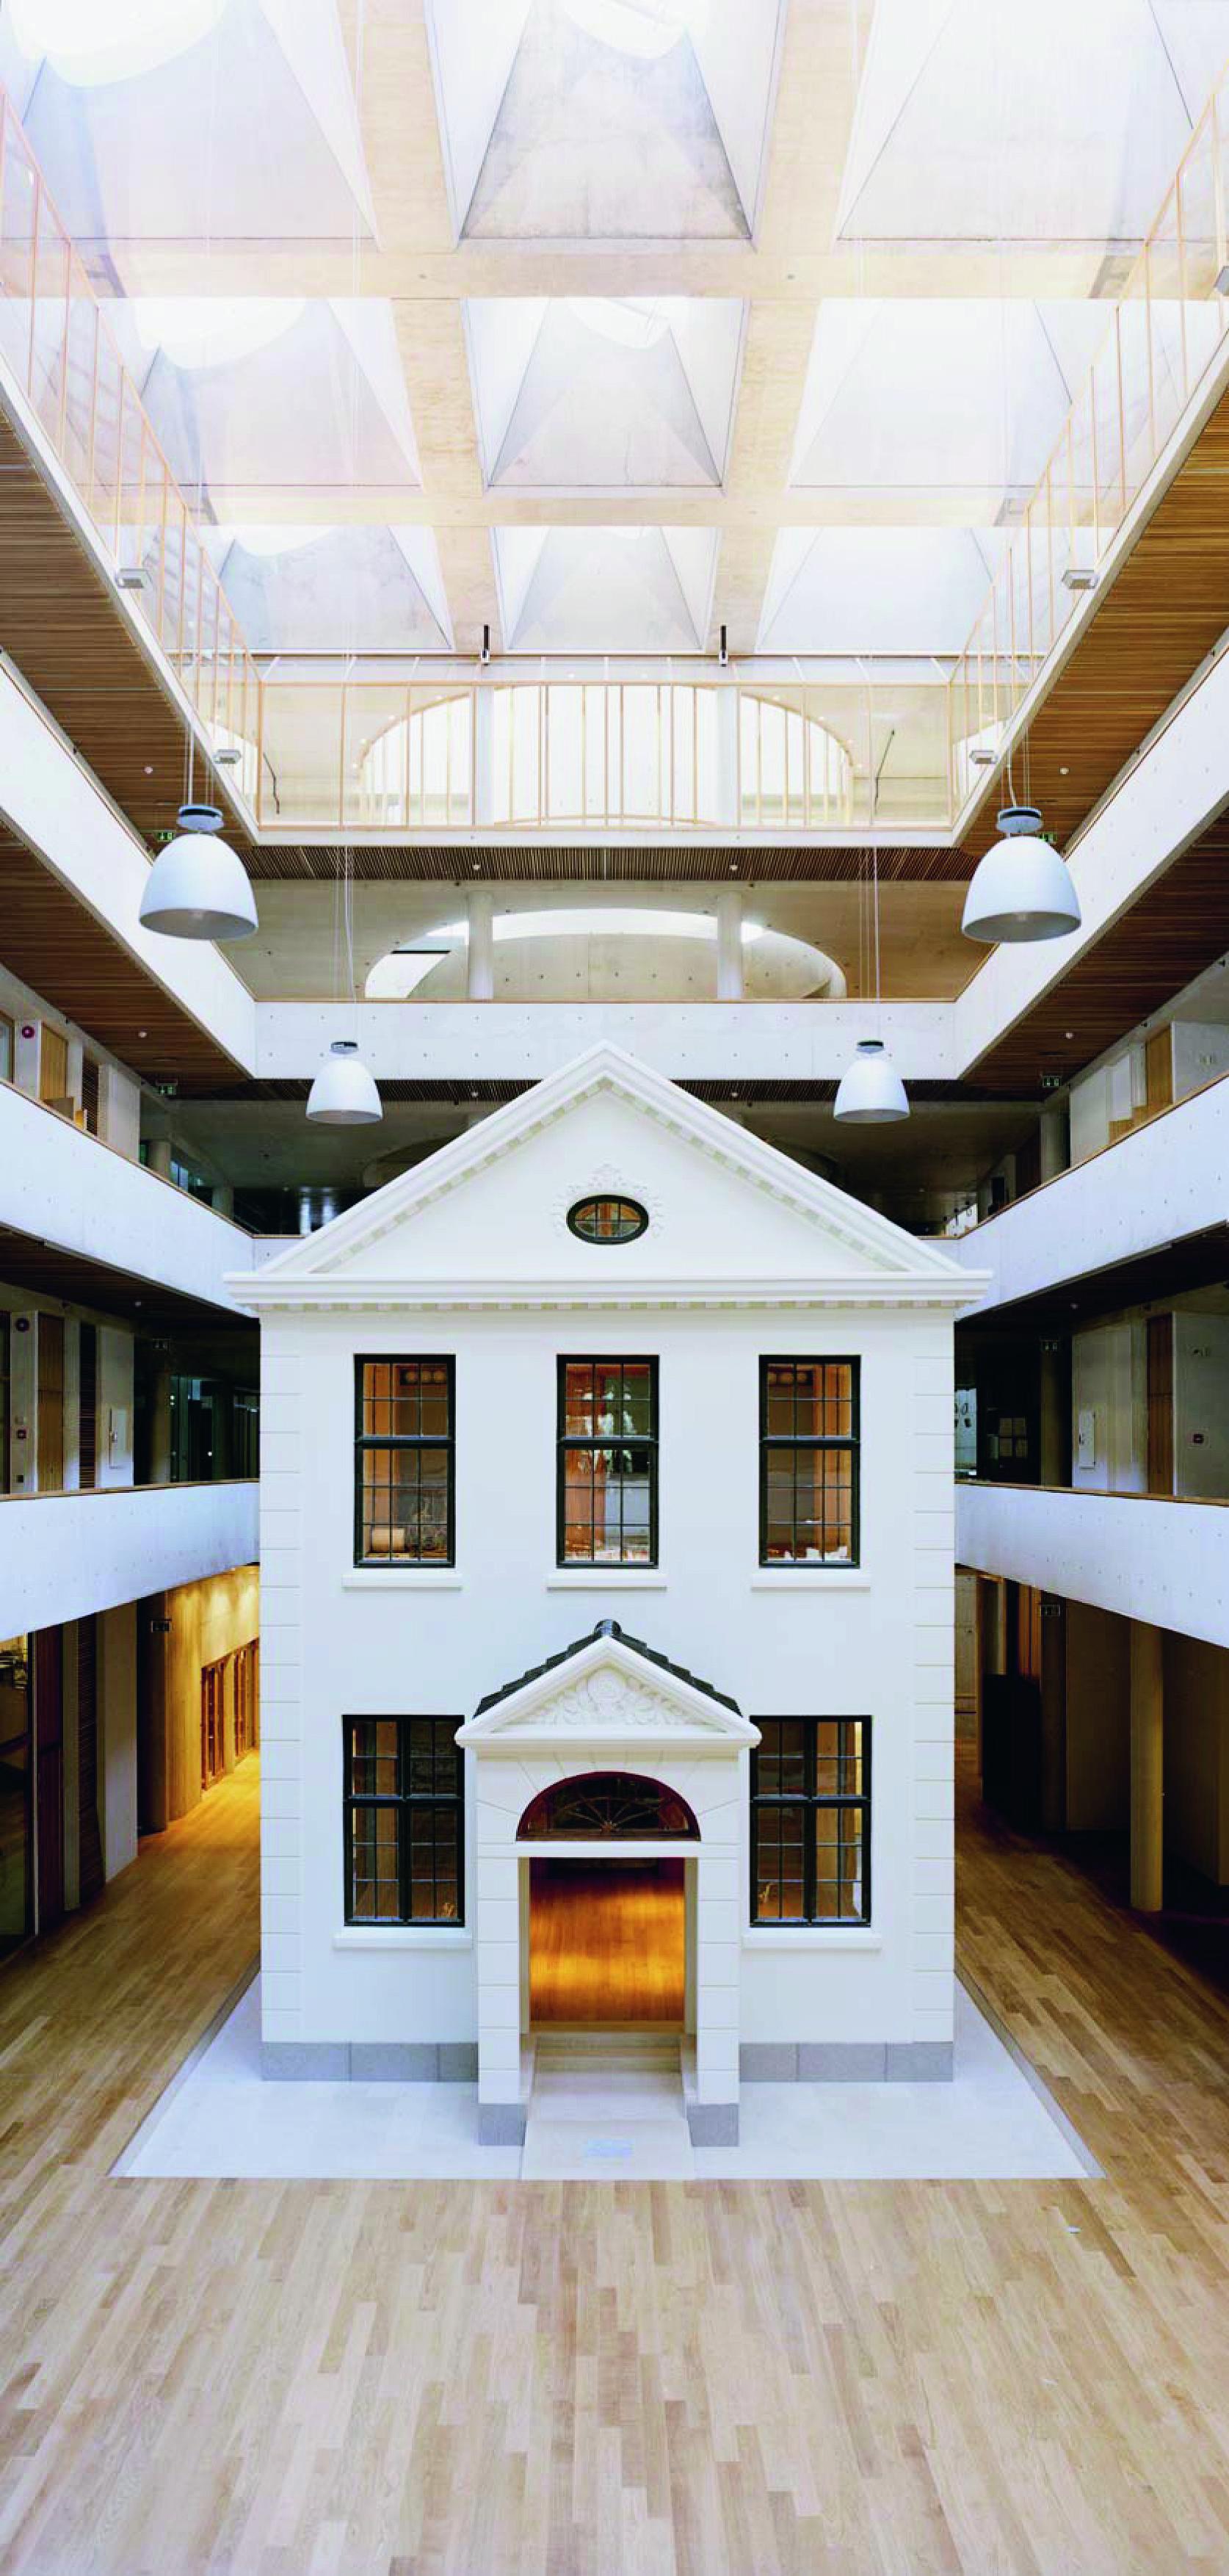 Danskehuset